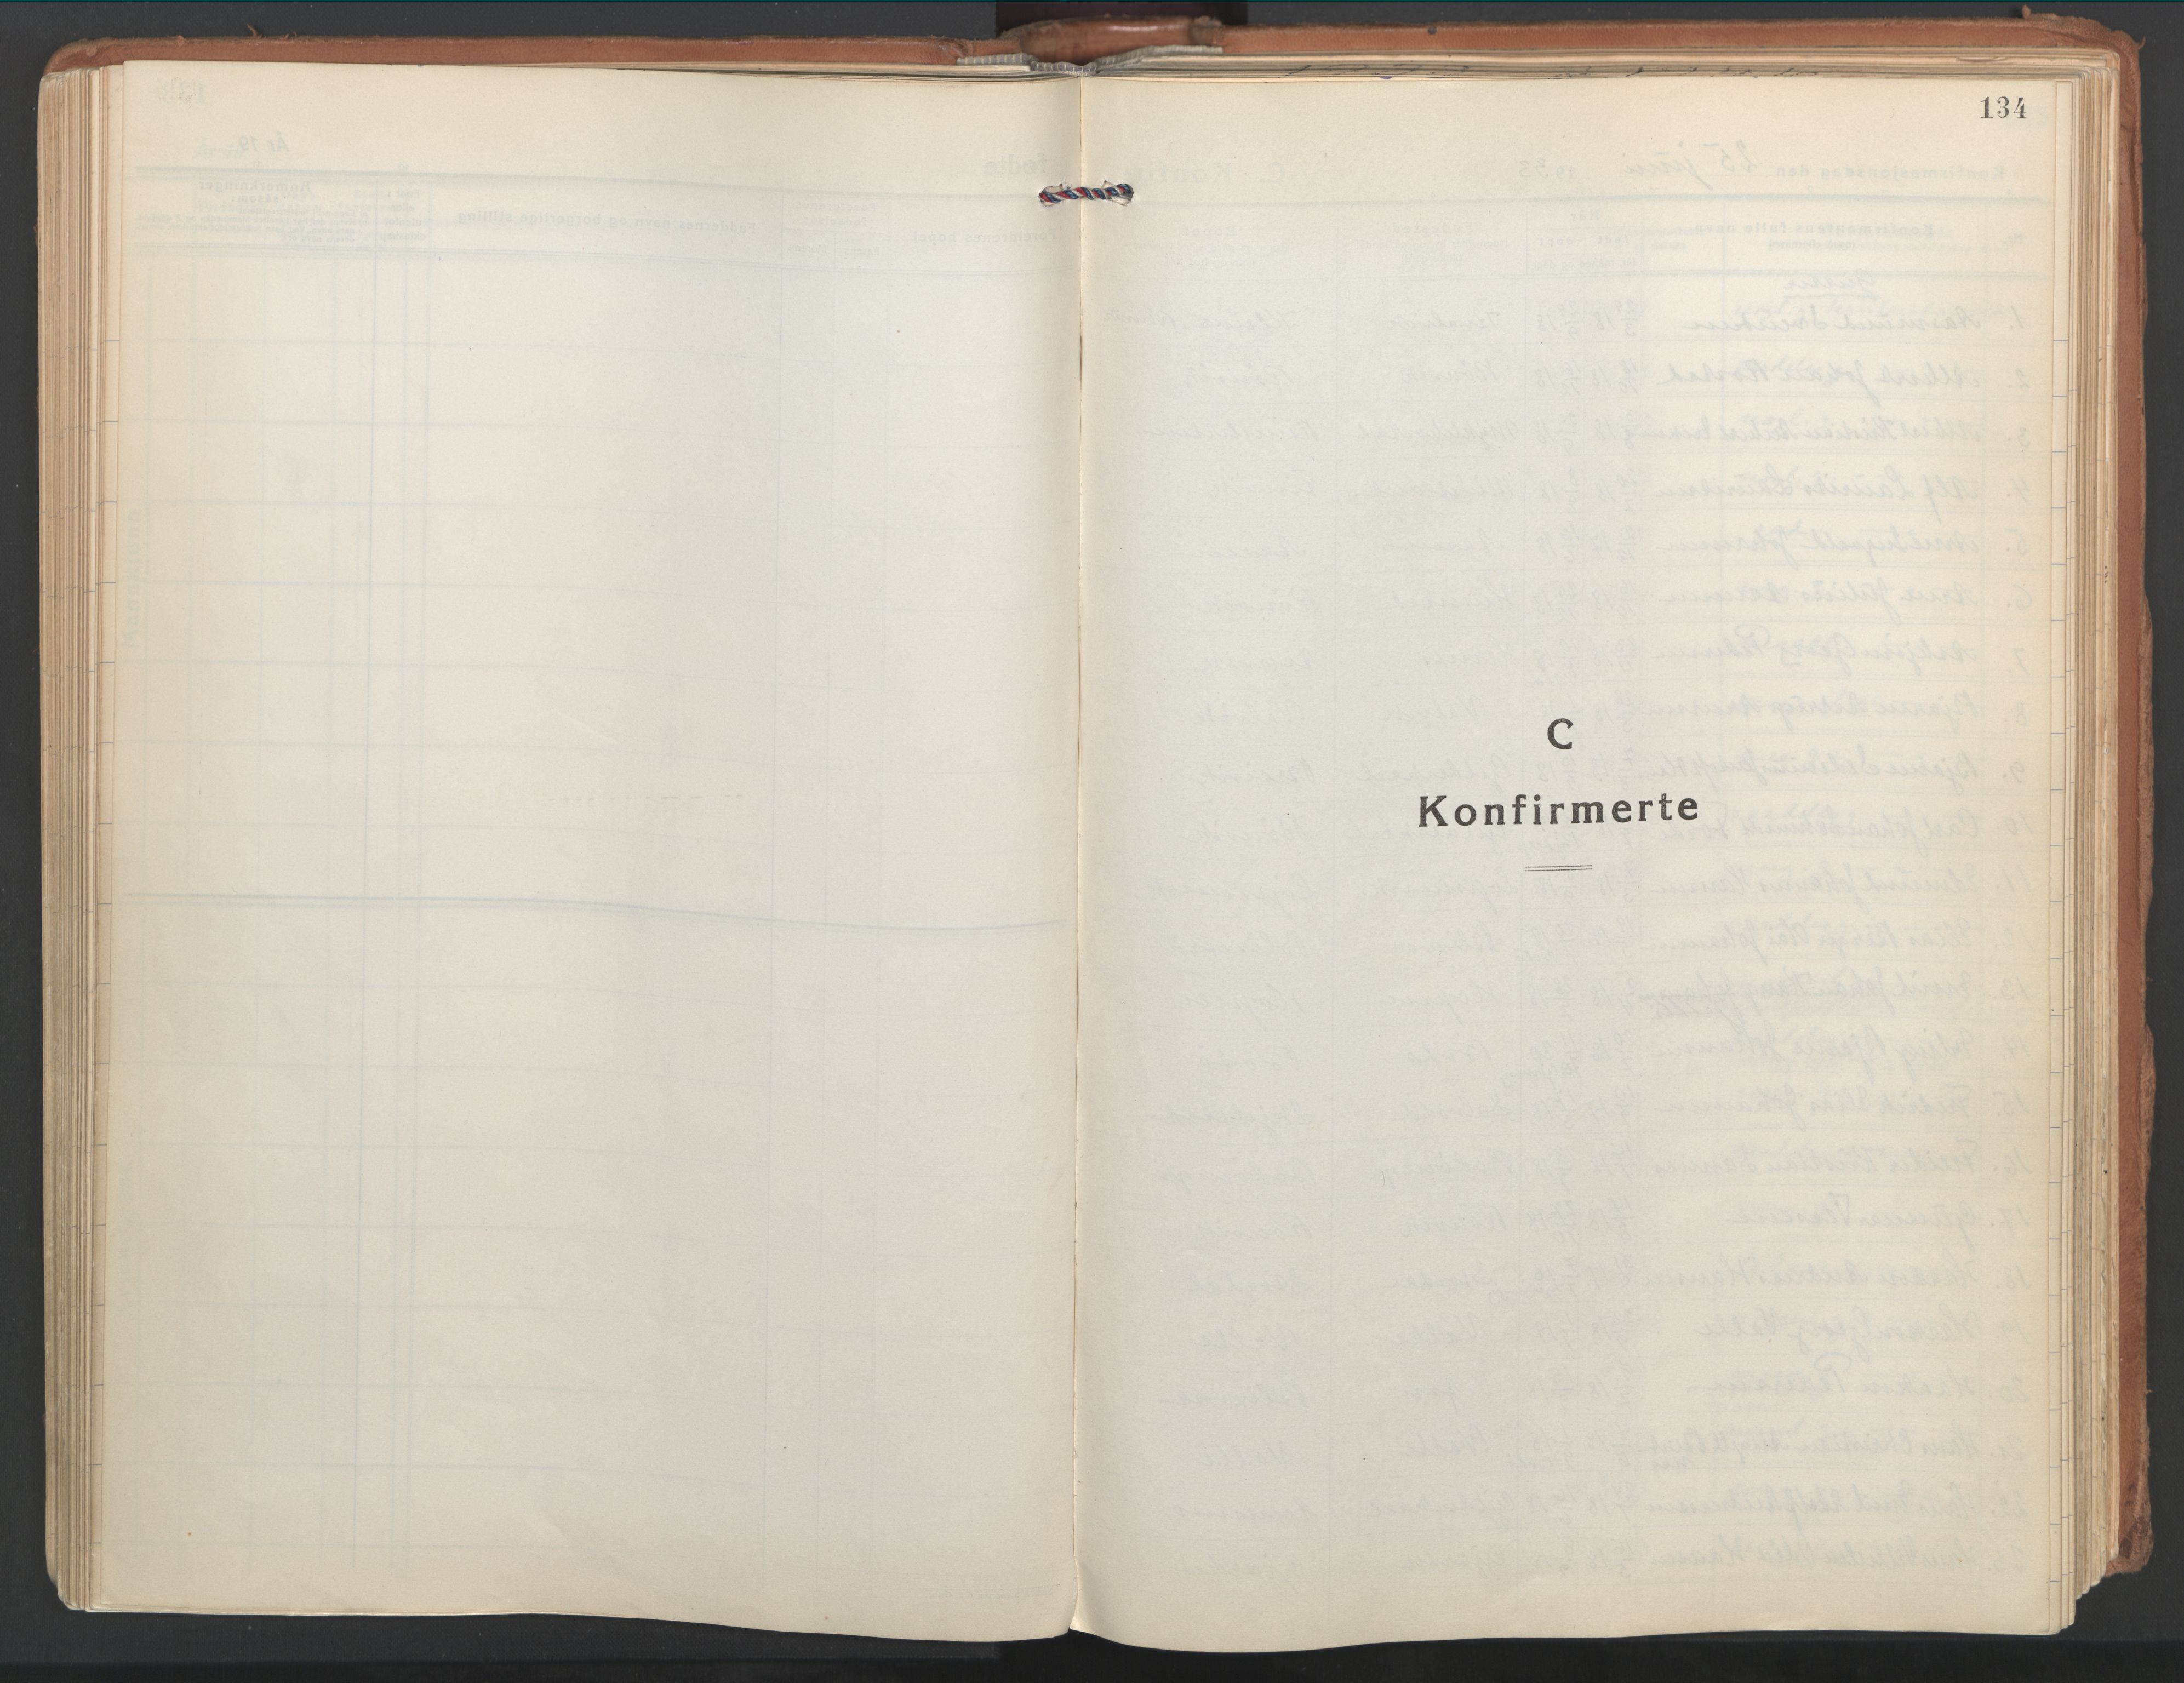 SAT, Ministerialprotokoller, klokkerbøker og fødselsregistre - Nordland, 802/L0061: Ministerialbok nr. 802A08, 1933-1946, s. 134